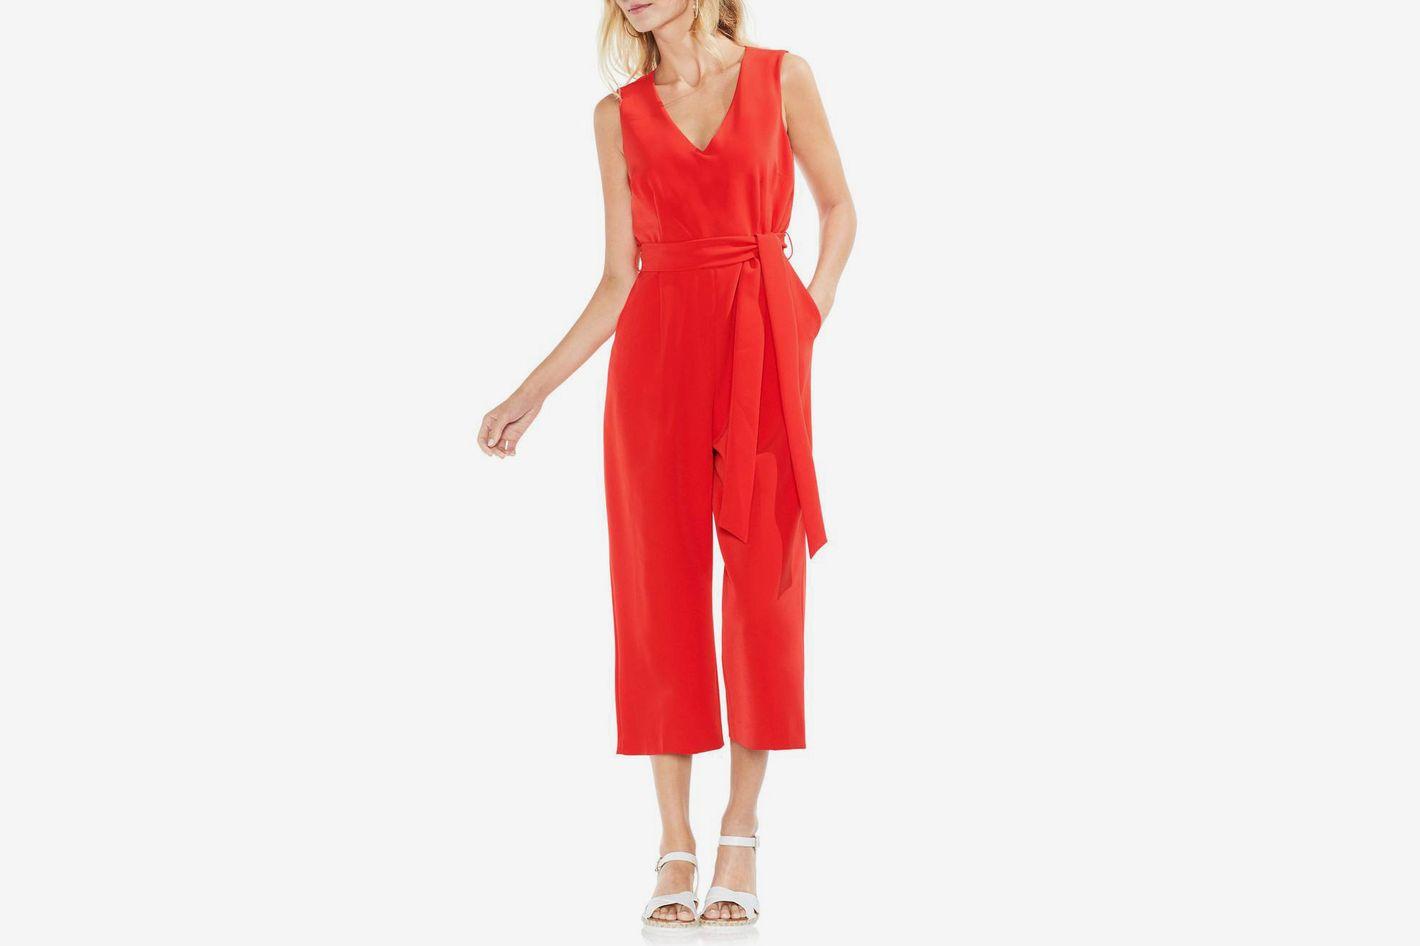 e91996902297 VINCE CAMUTO Sleeveless Tie Waist Jumpsuit